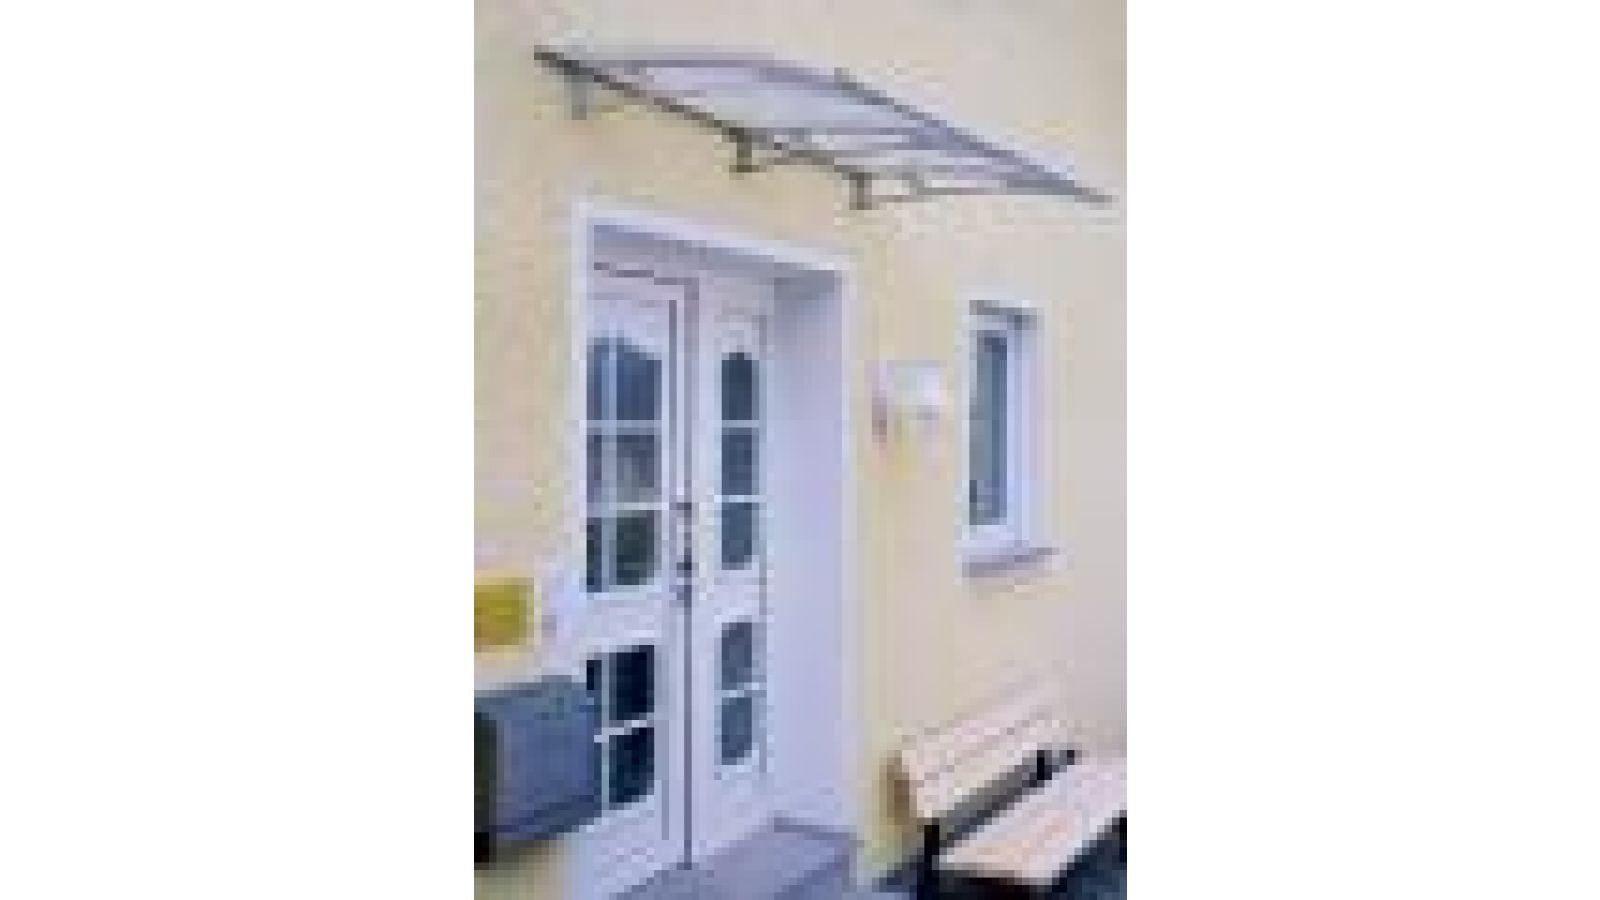 Lightline 1900 canopy